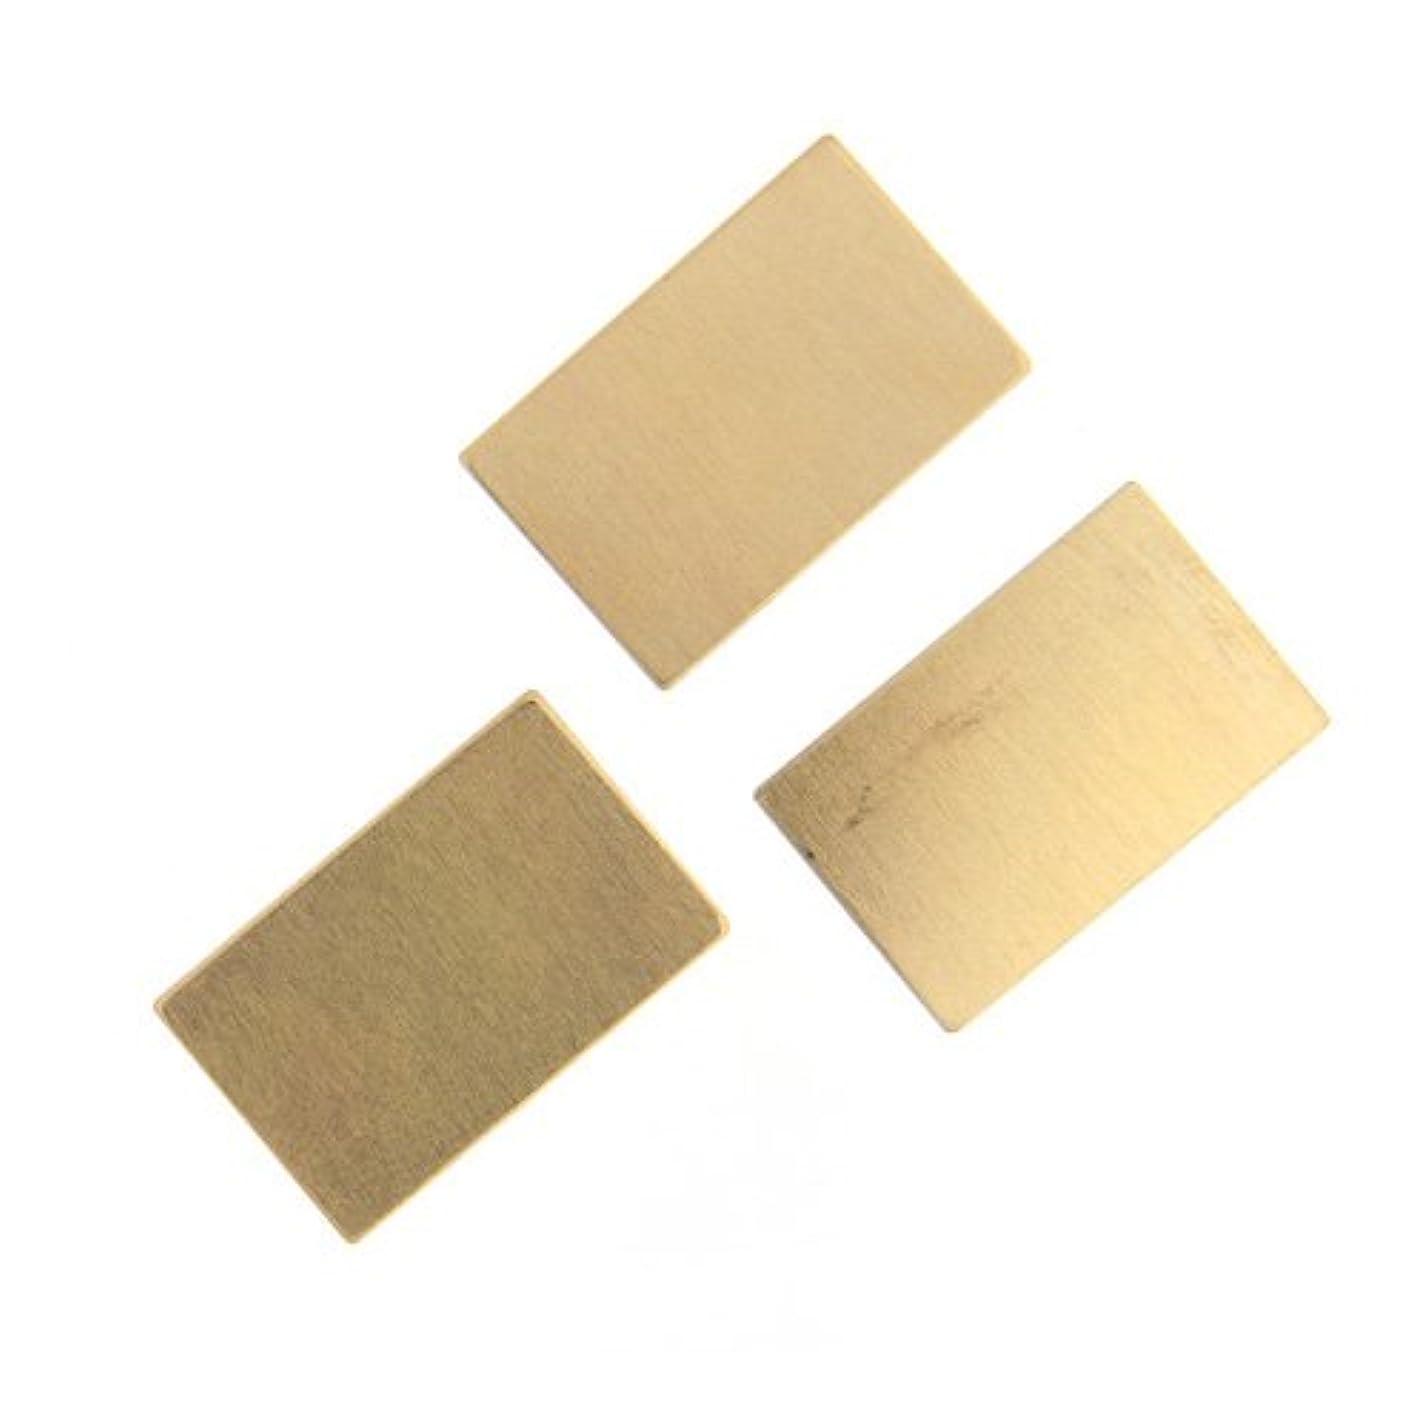 Metal Stamping Blank 2472401103-01 Metal Blank Brass bt02601396